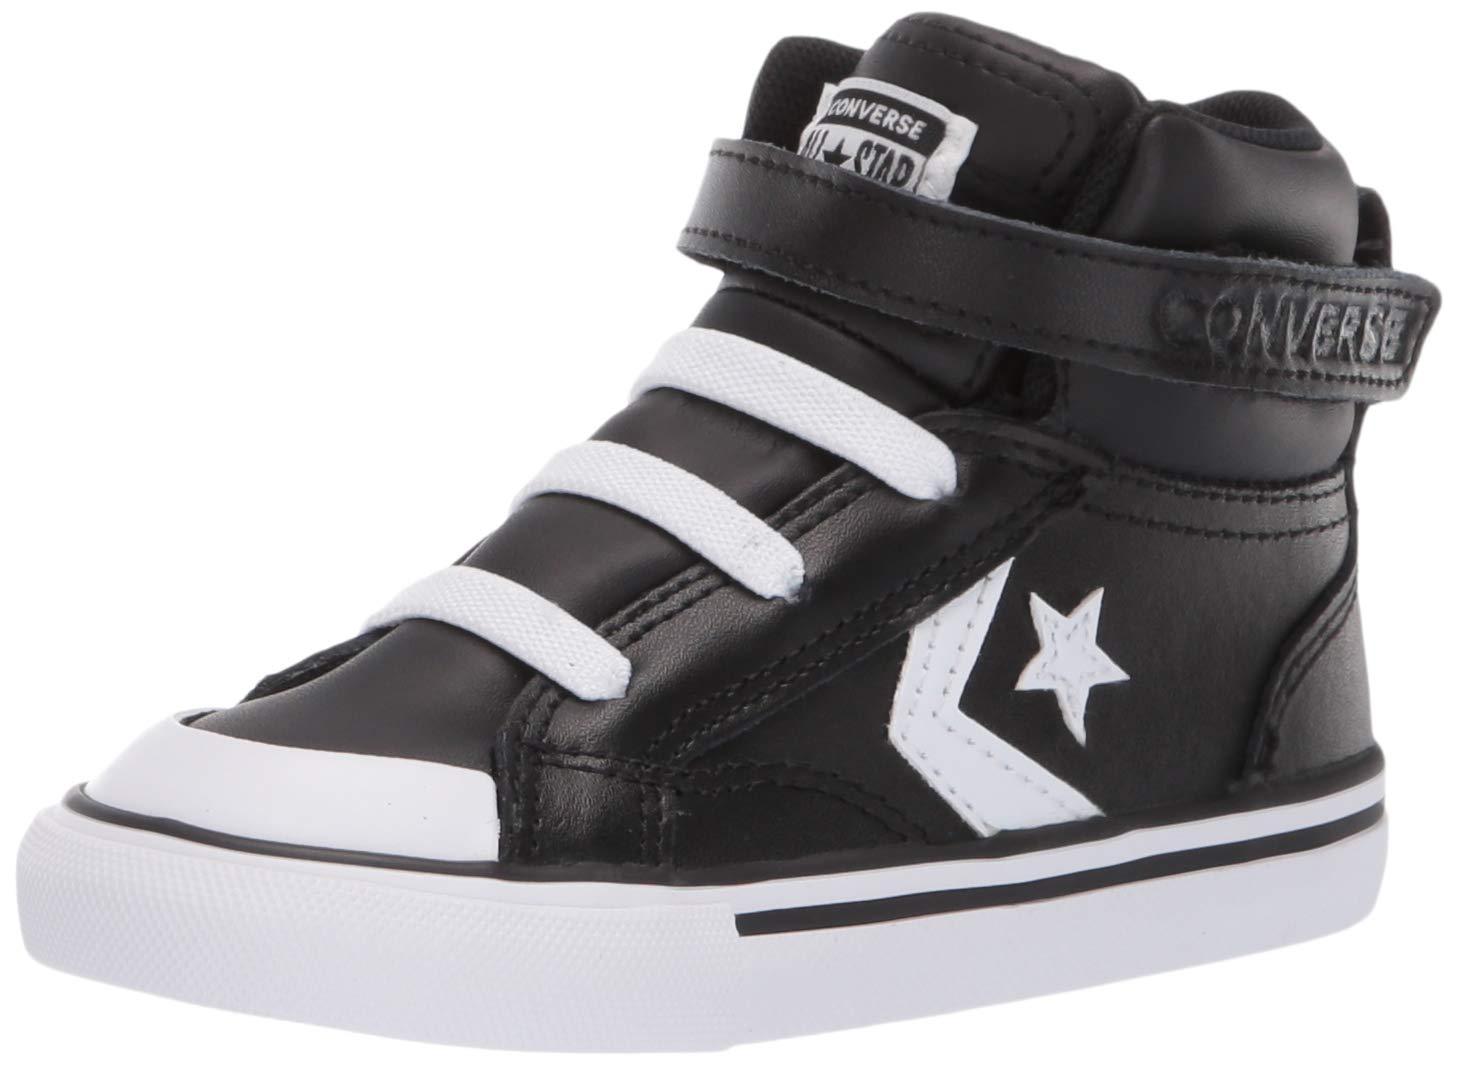 Converse Kids Infants Pro Blaze Strap Leather High Top Sneaker